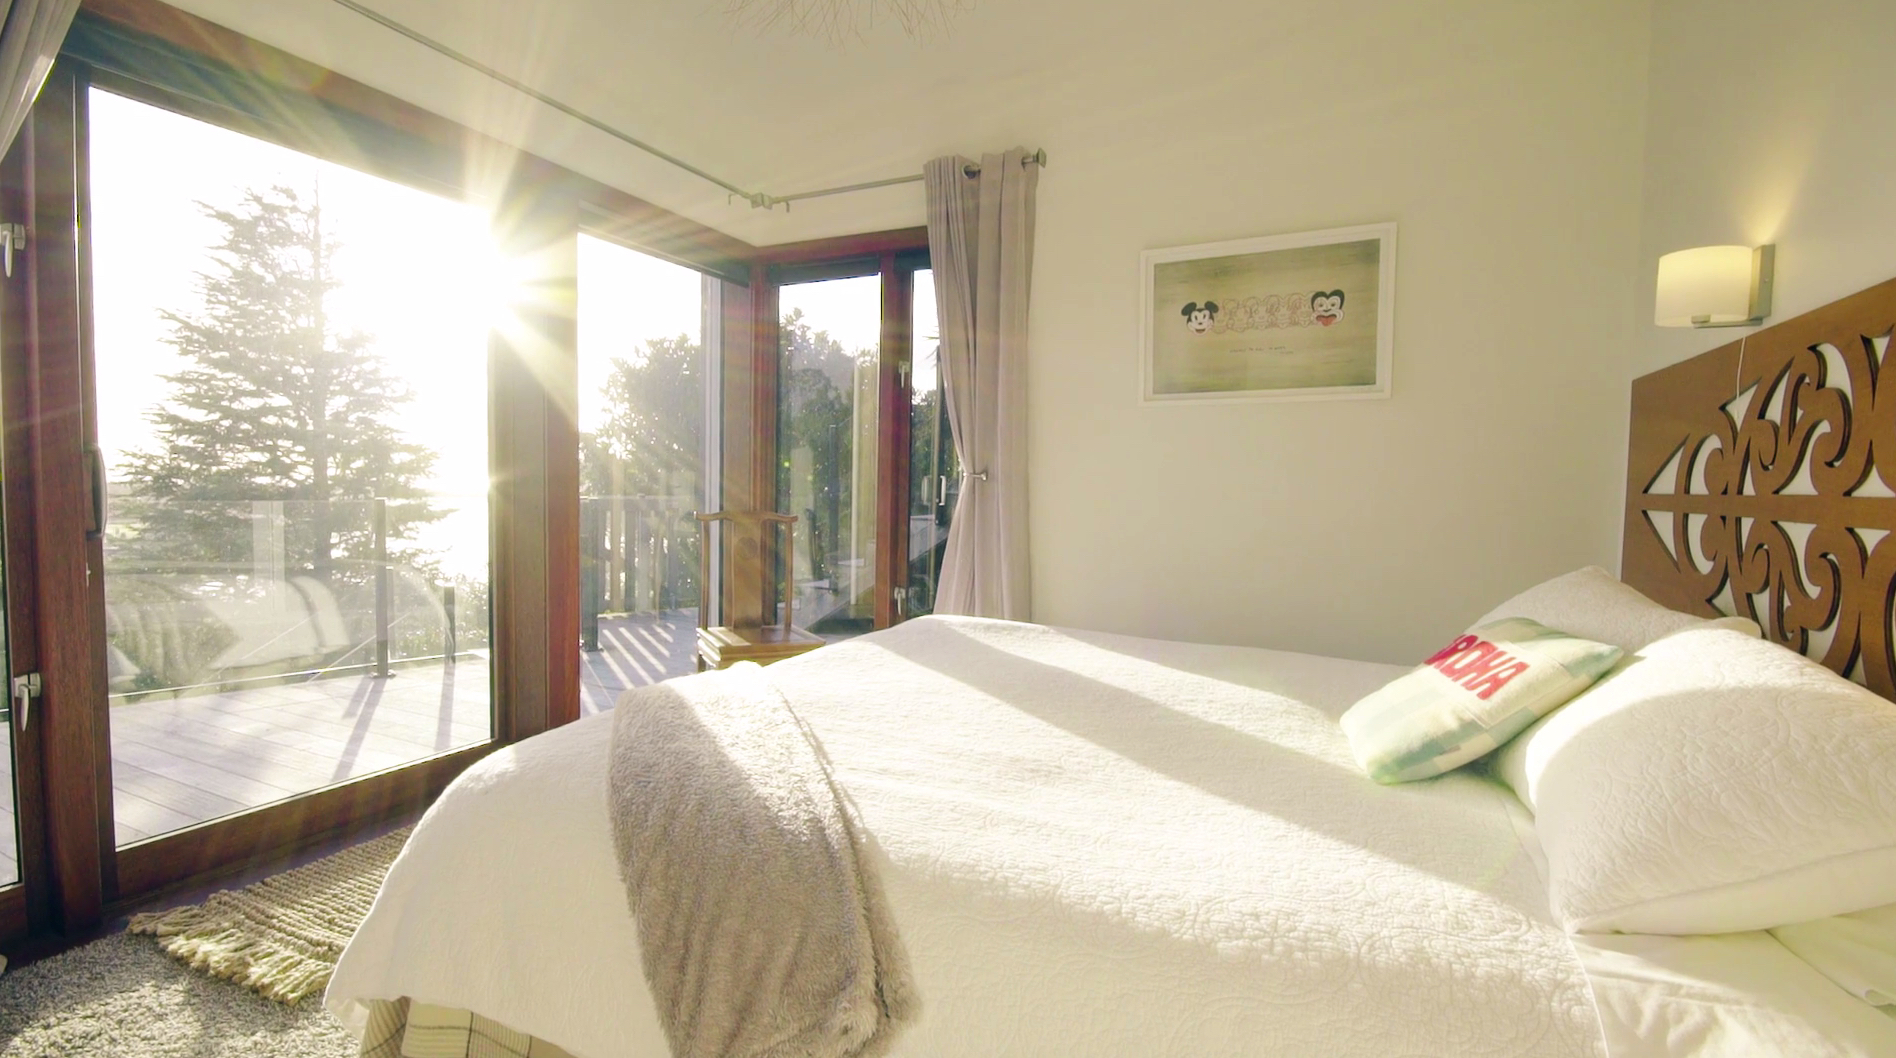 Sunlover Paku Suite Room